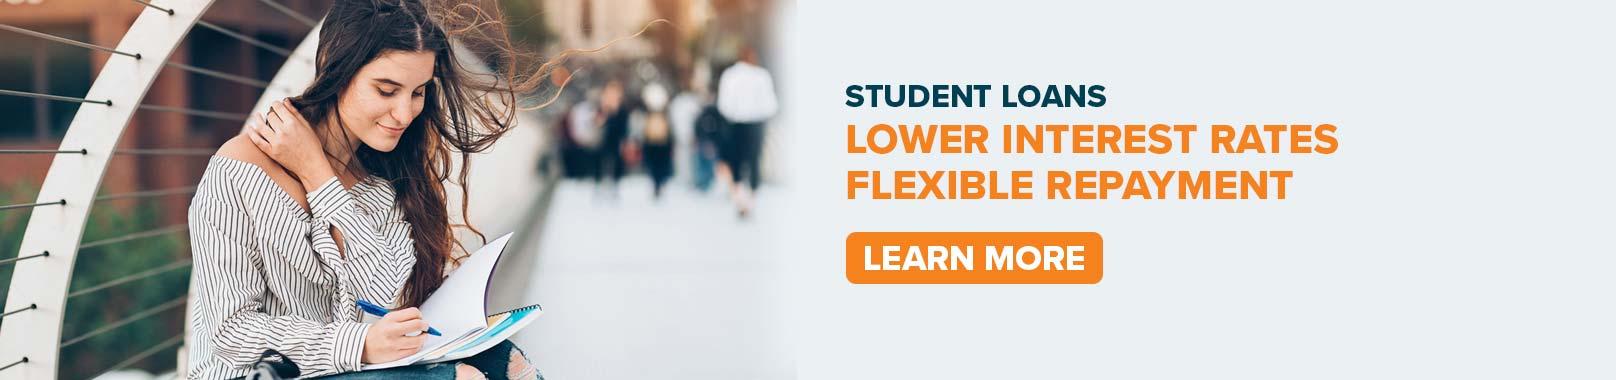 Denali Student Loans